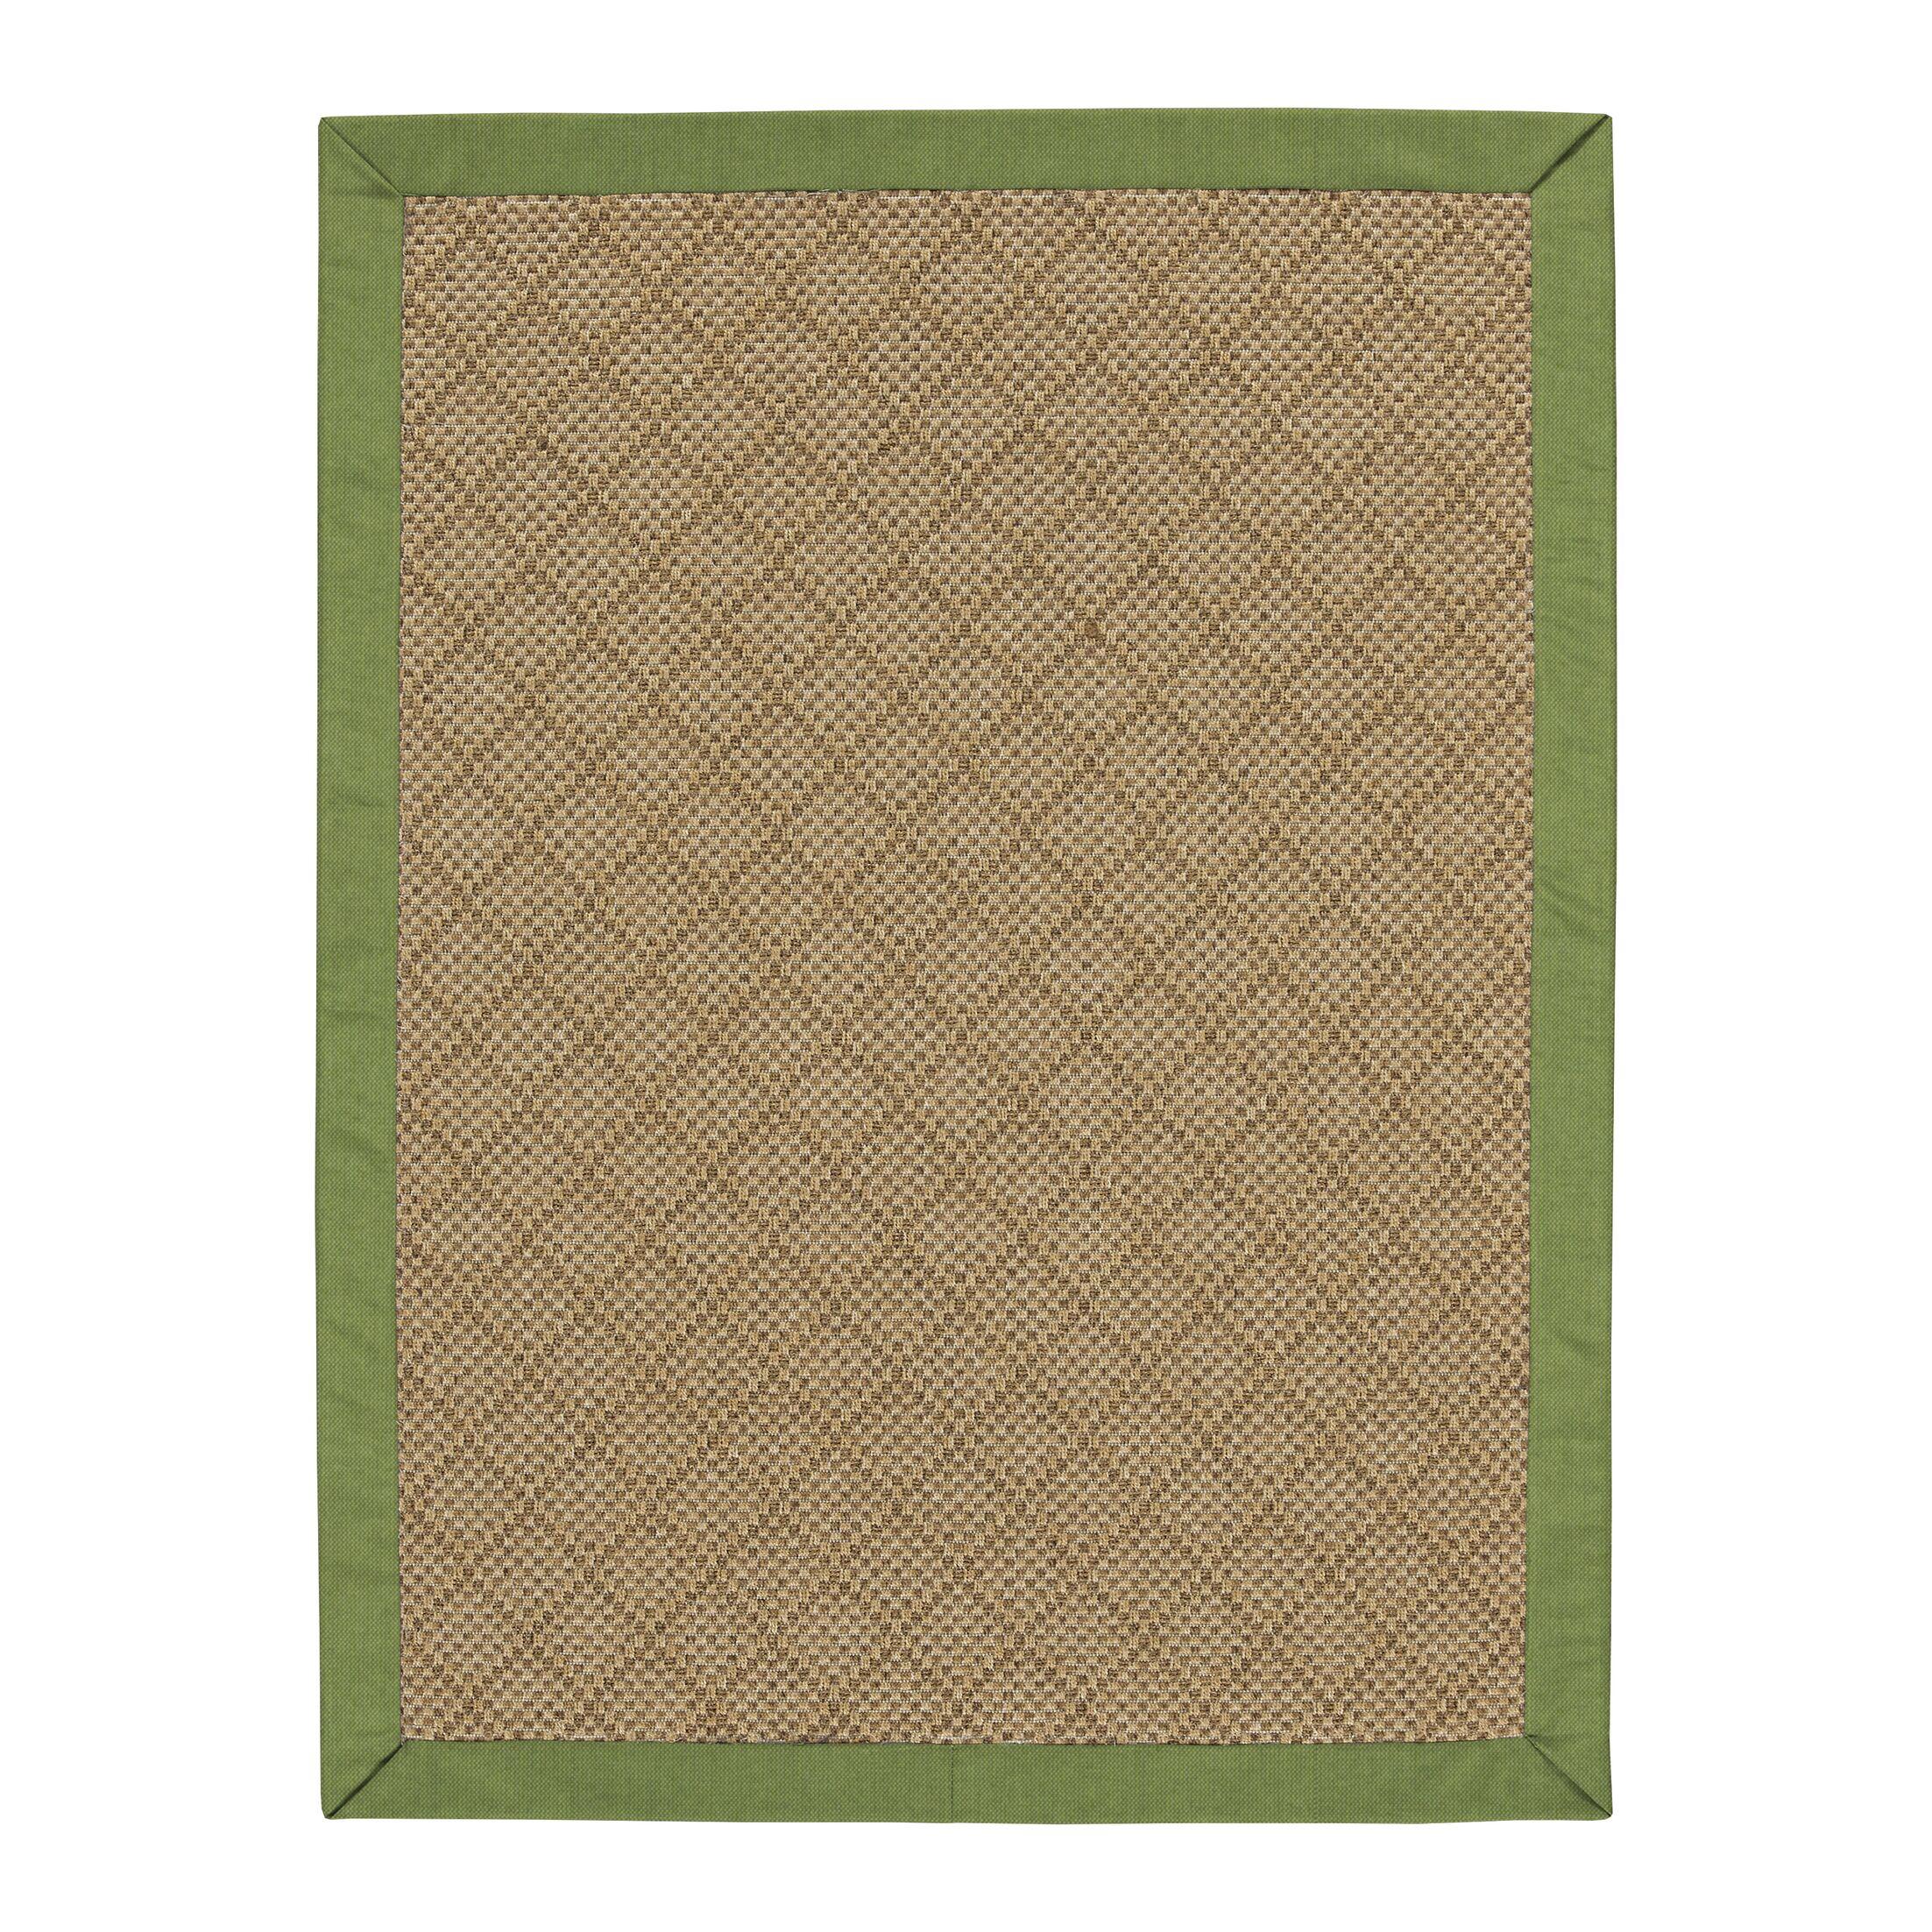 Major Sunbrella Green Indoor/Outdoor Area Rug Rug Size: Rectangle 8' x 10'